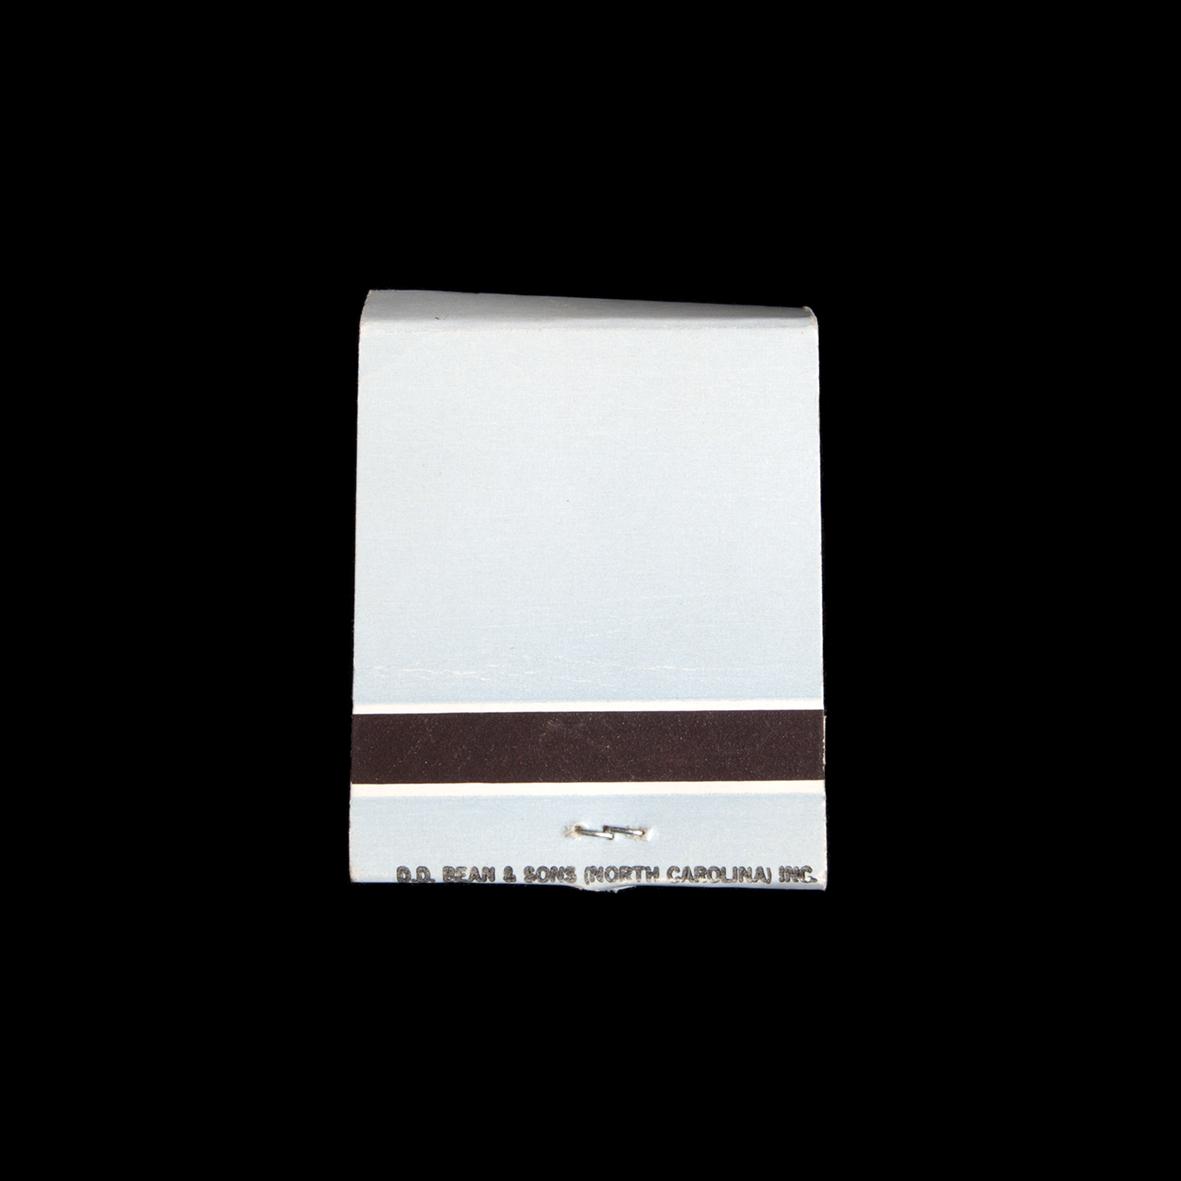 MatchBook Archive_61.JPG